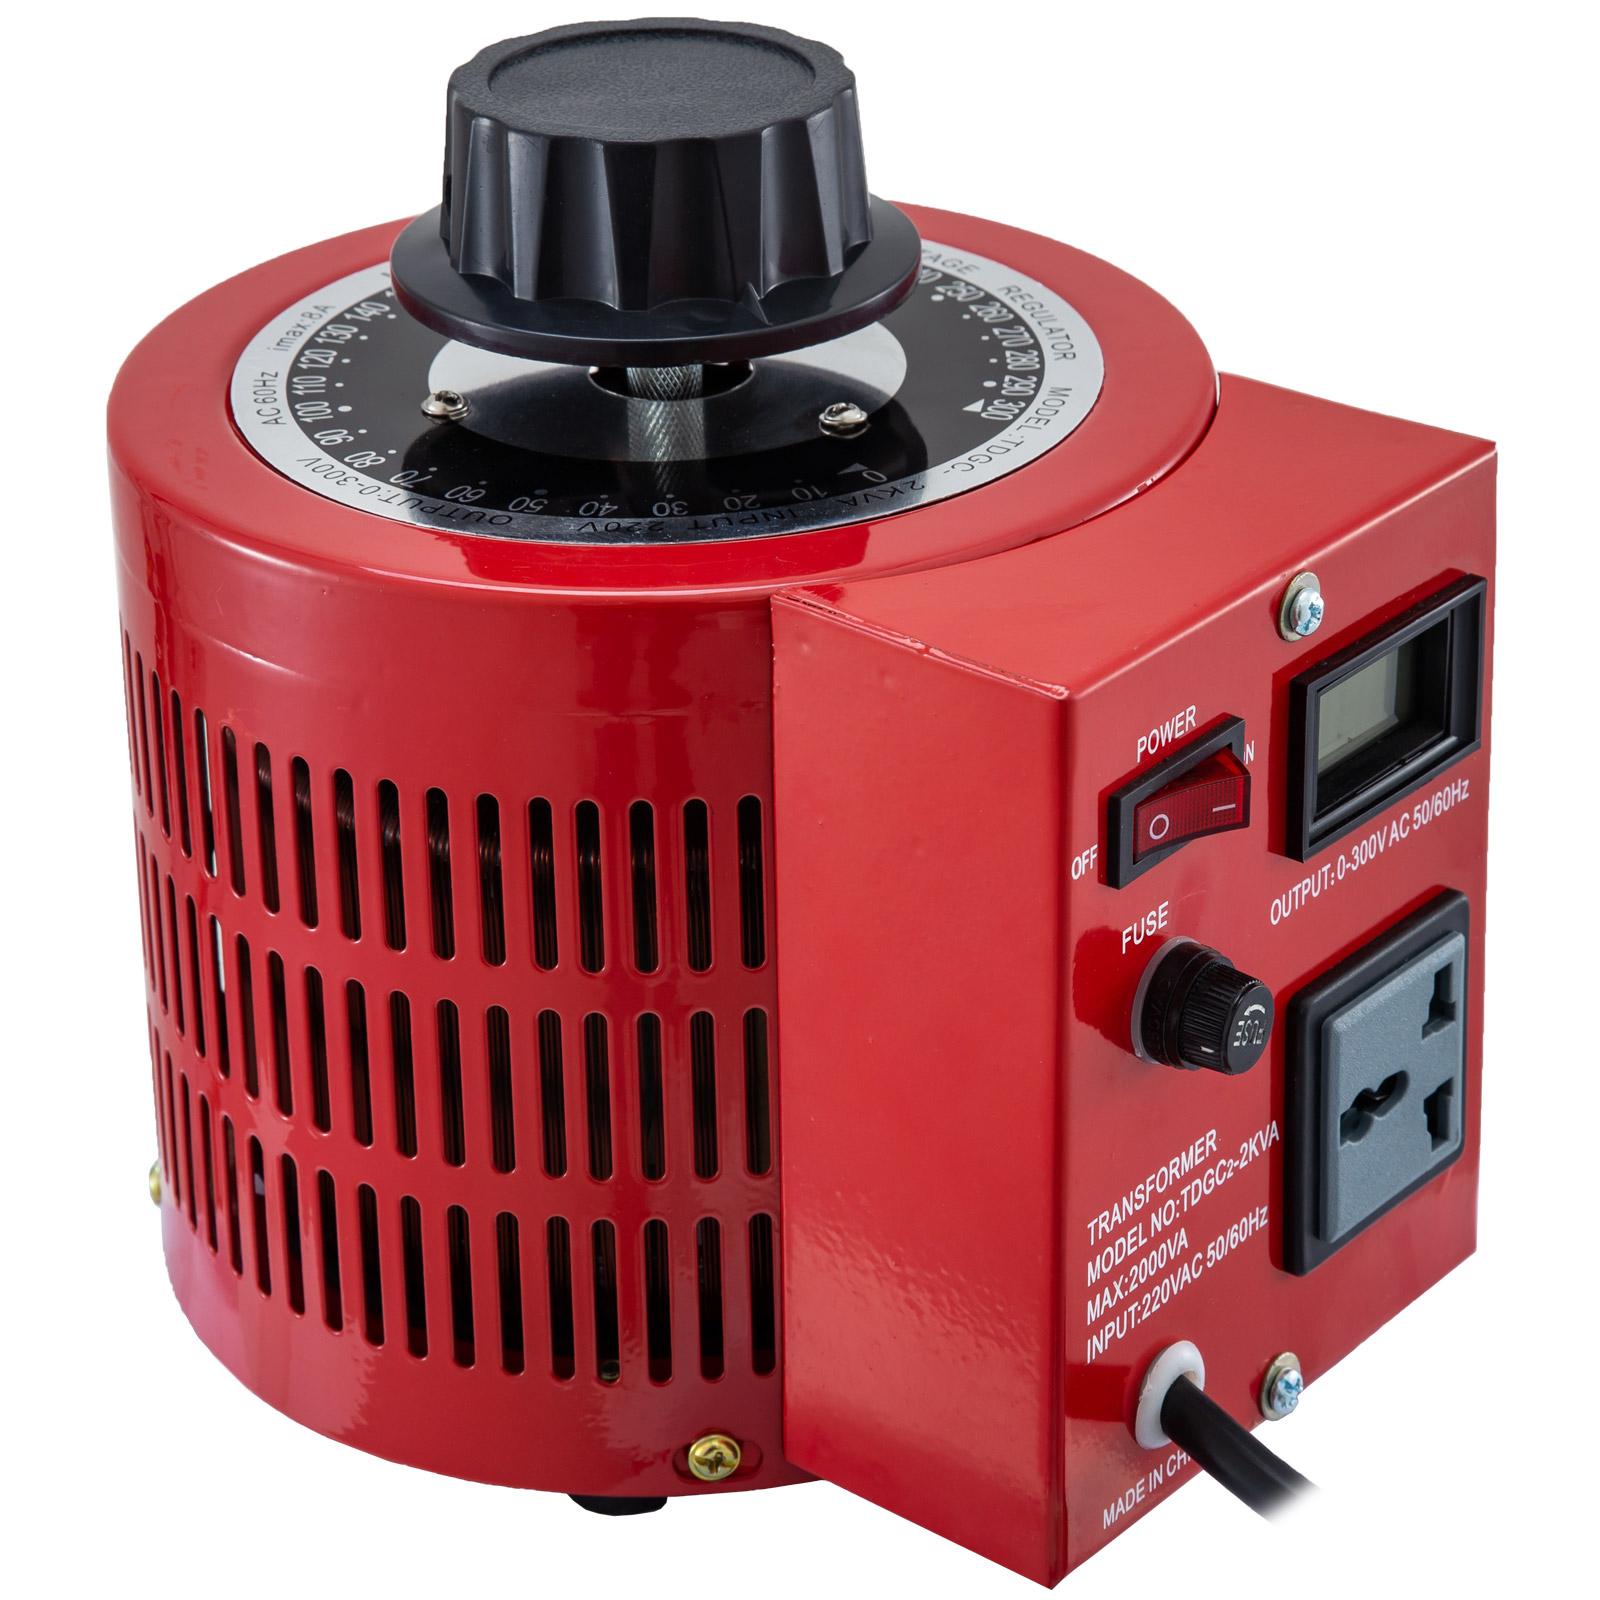 Auto-Variac-Variable-Transformer-0-5-1-2-3KVA-Regulator-pure-copper-coil-220V thumbnail 60